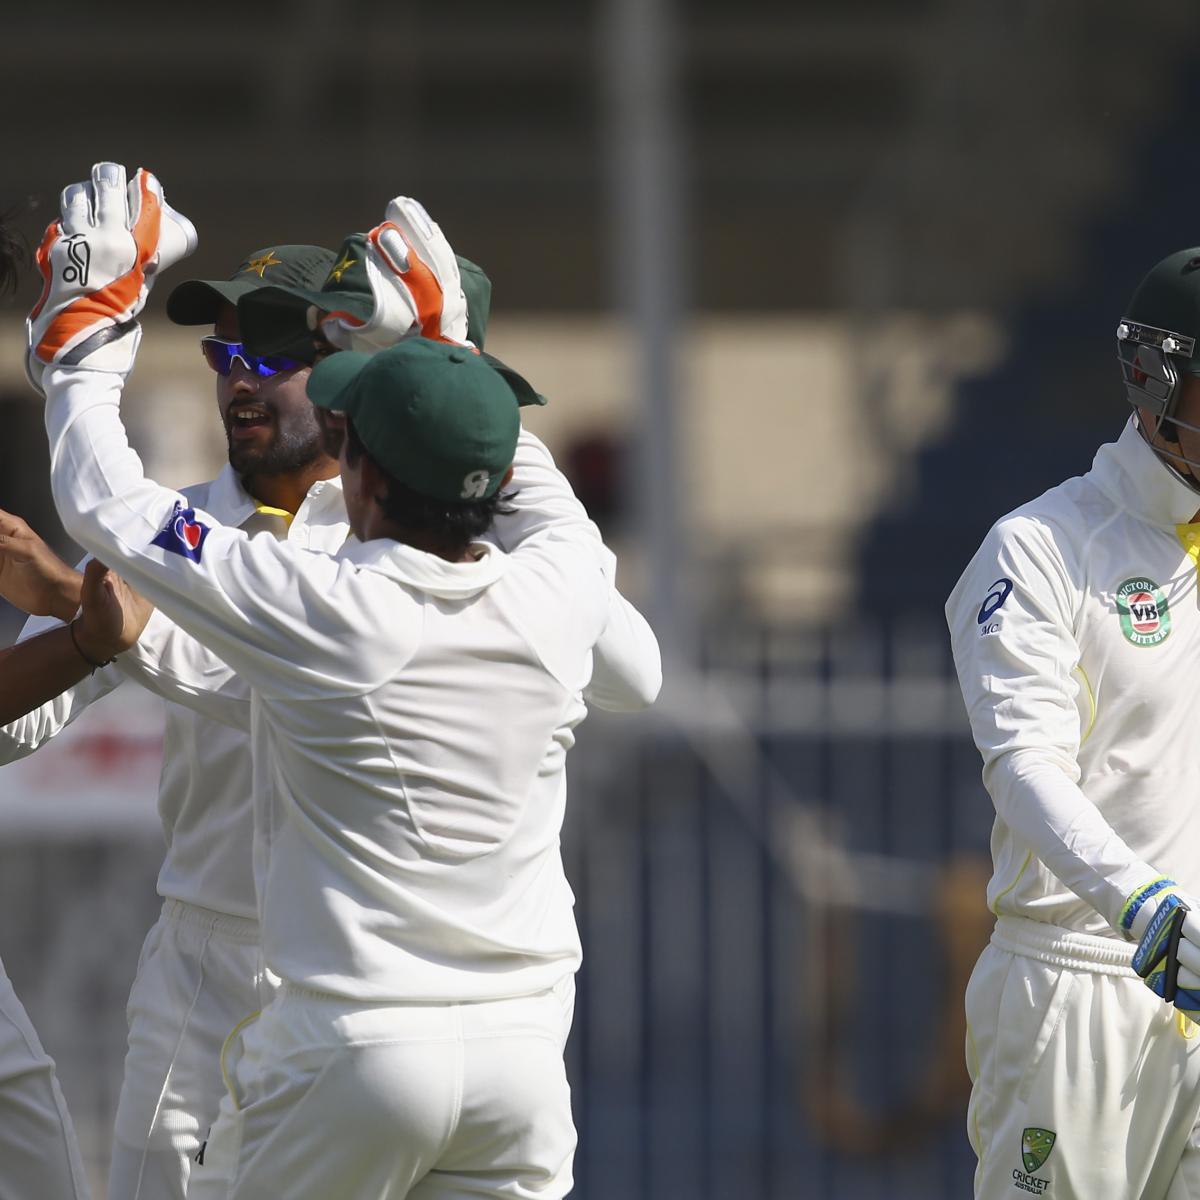 Pakistan Vs. Australia 1st Test: Date, Live Stream, TV